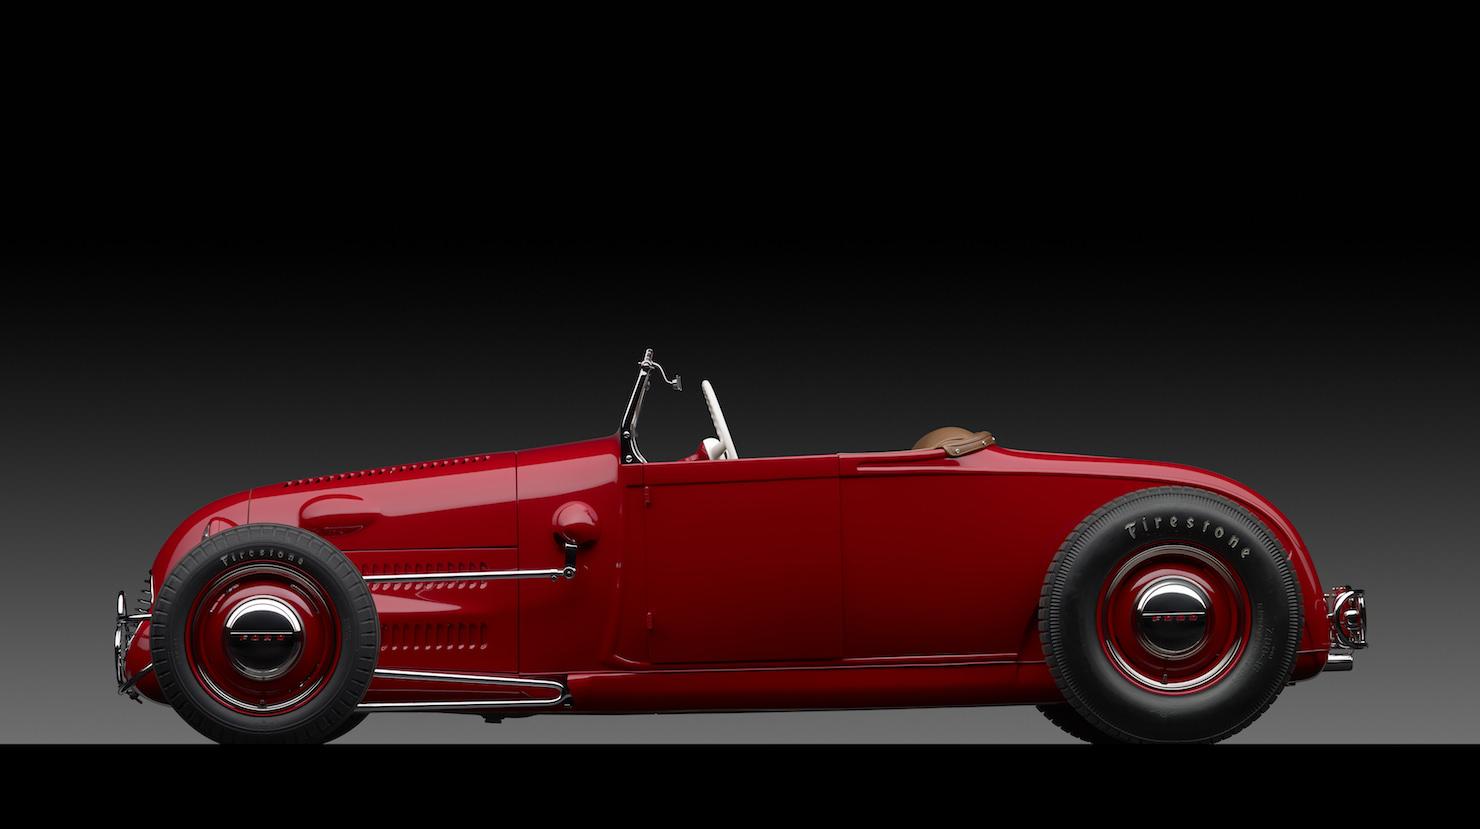 1929 Ford Dick Flint Roadster